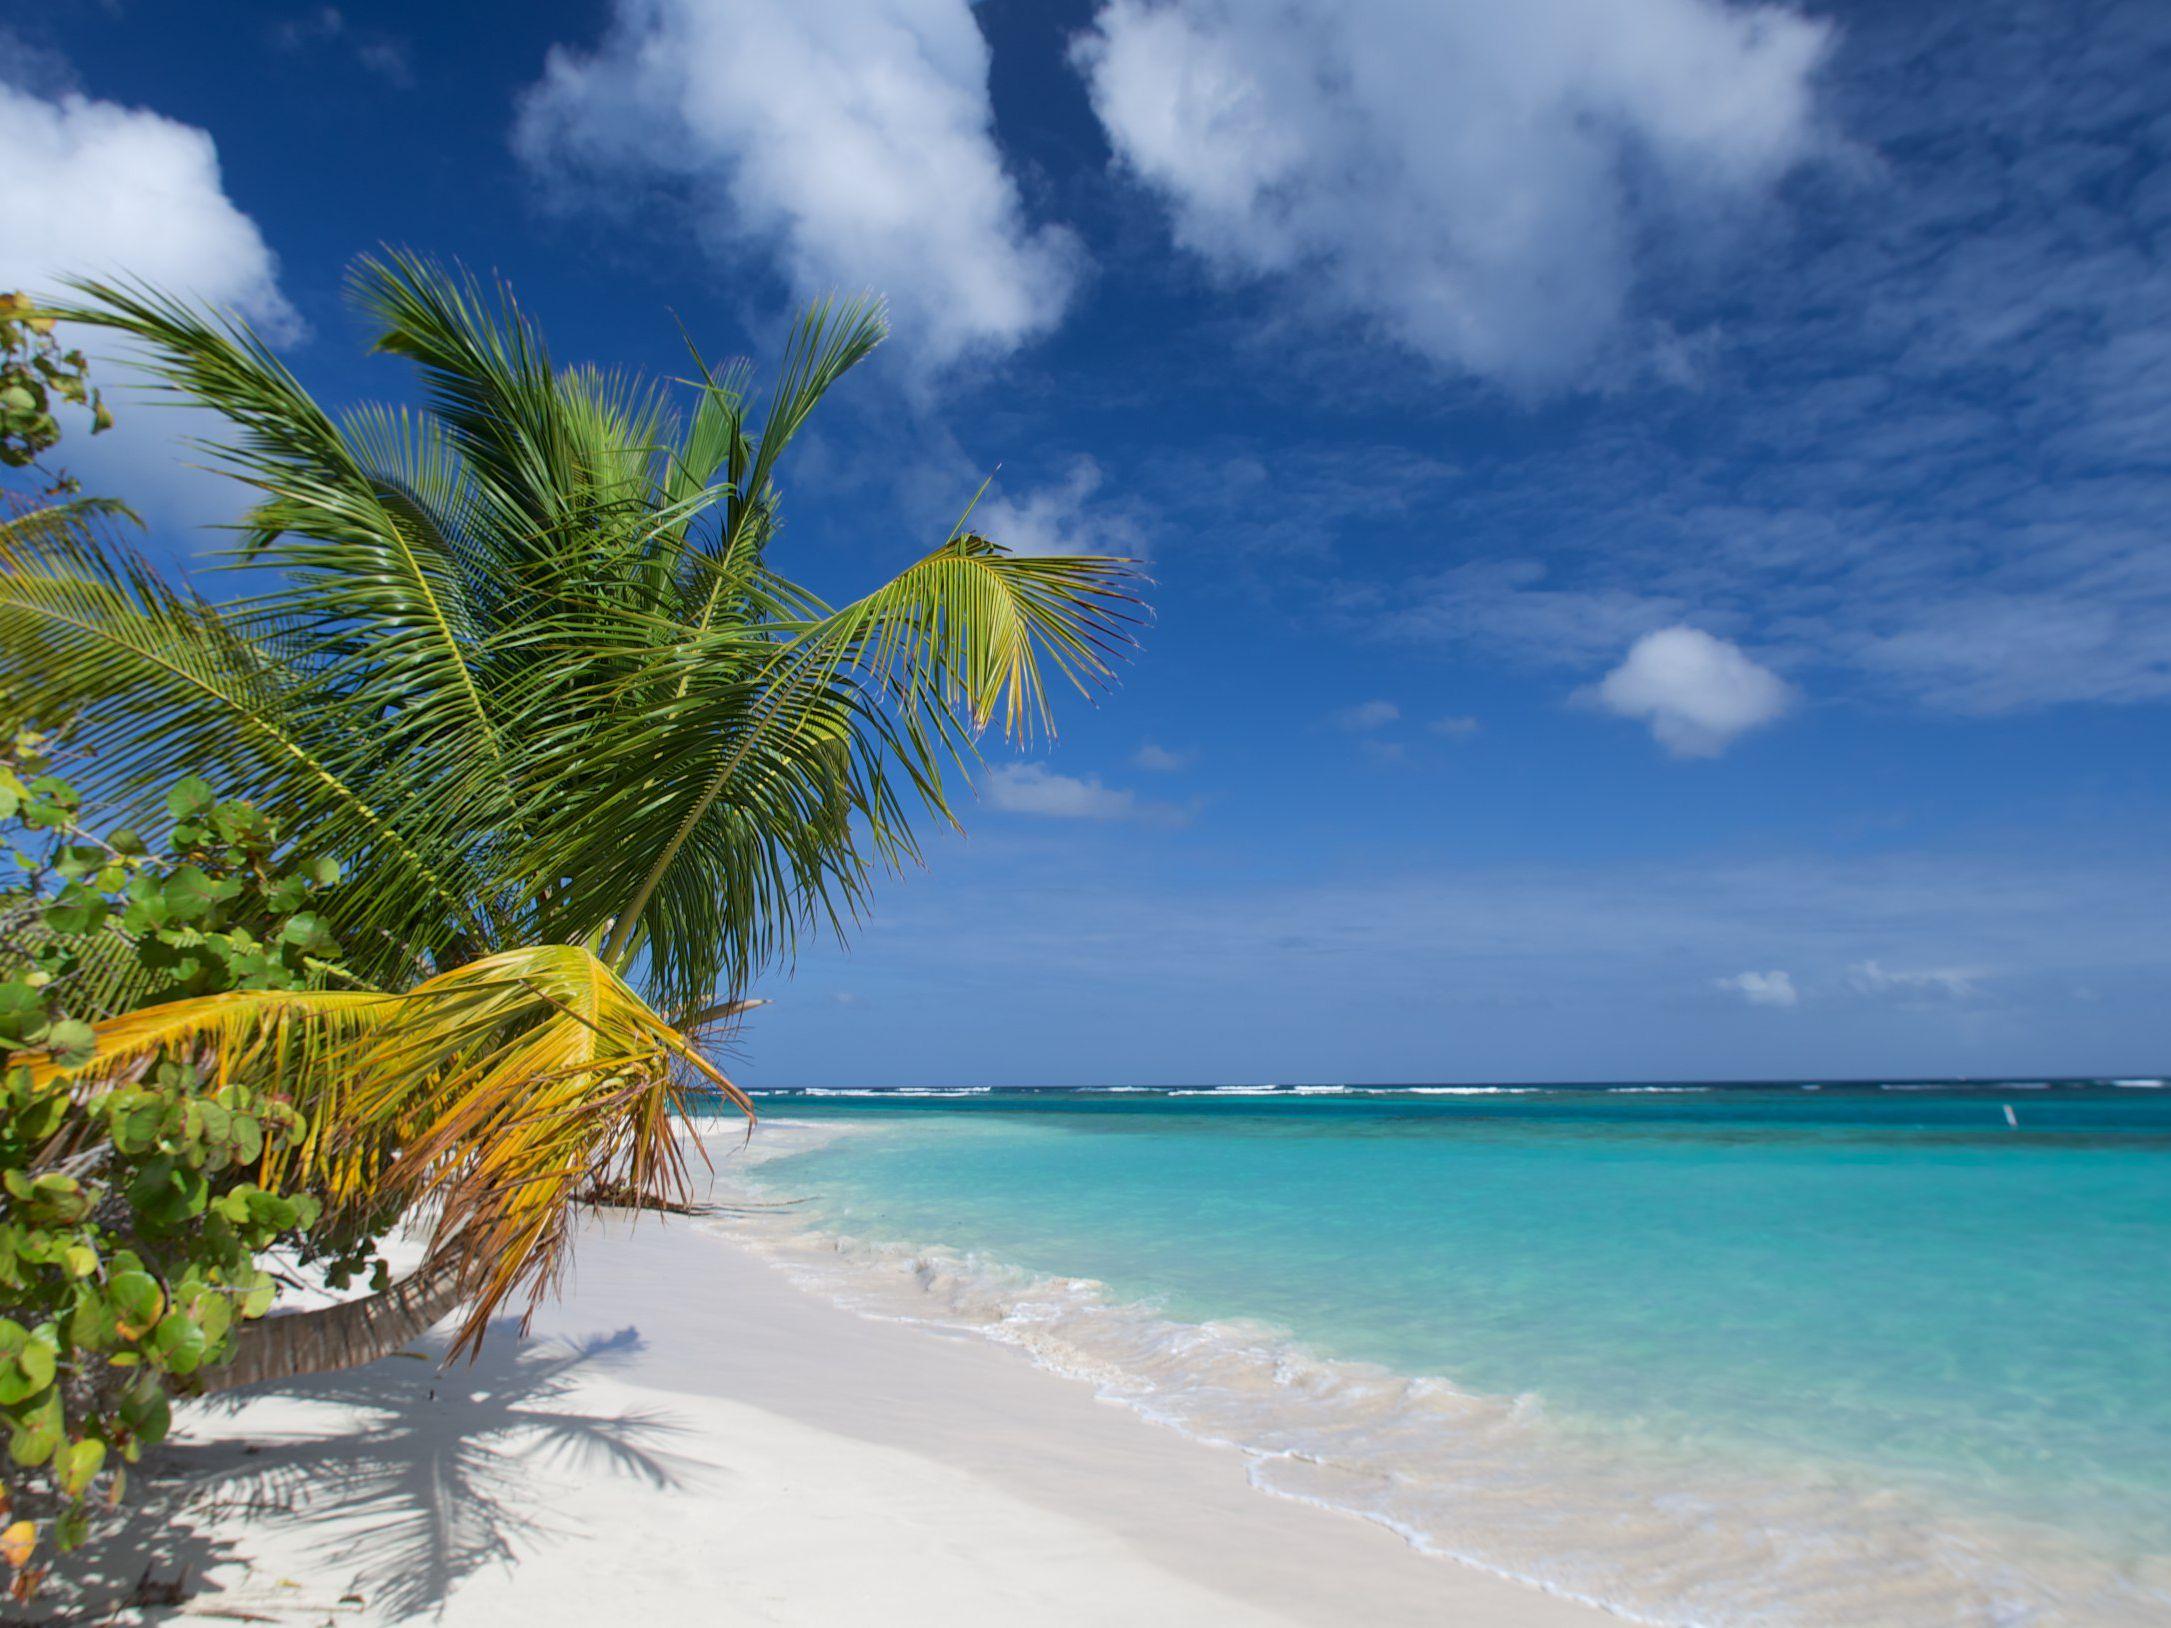 The Beaches Of Culebra Puerto Rico